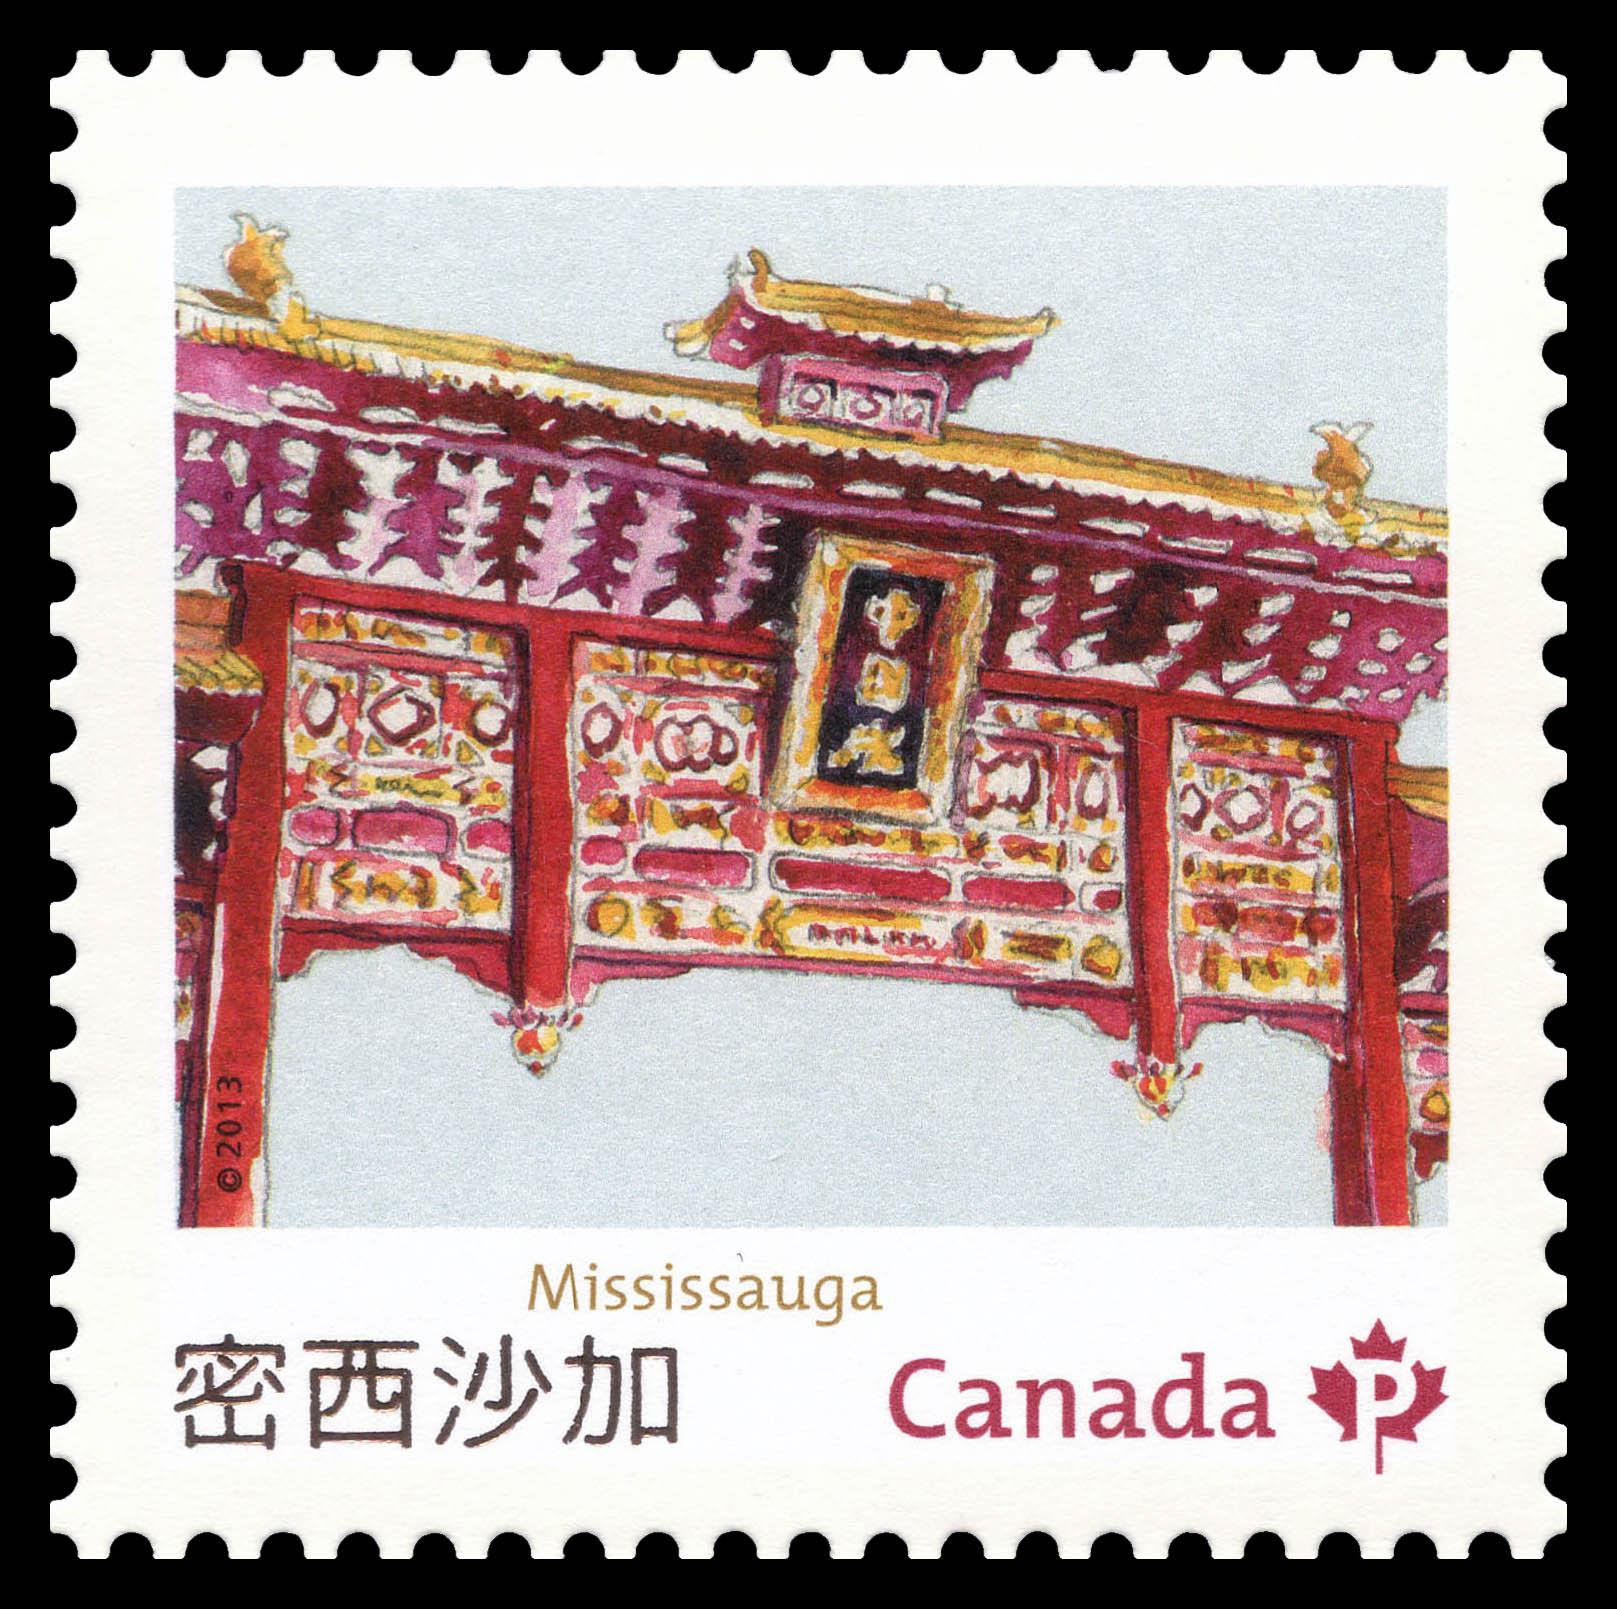 Mississauga Chinatown Gate Canada Postage Stamp